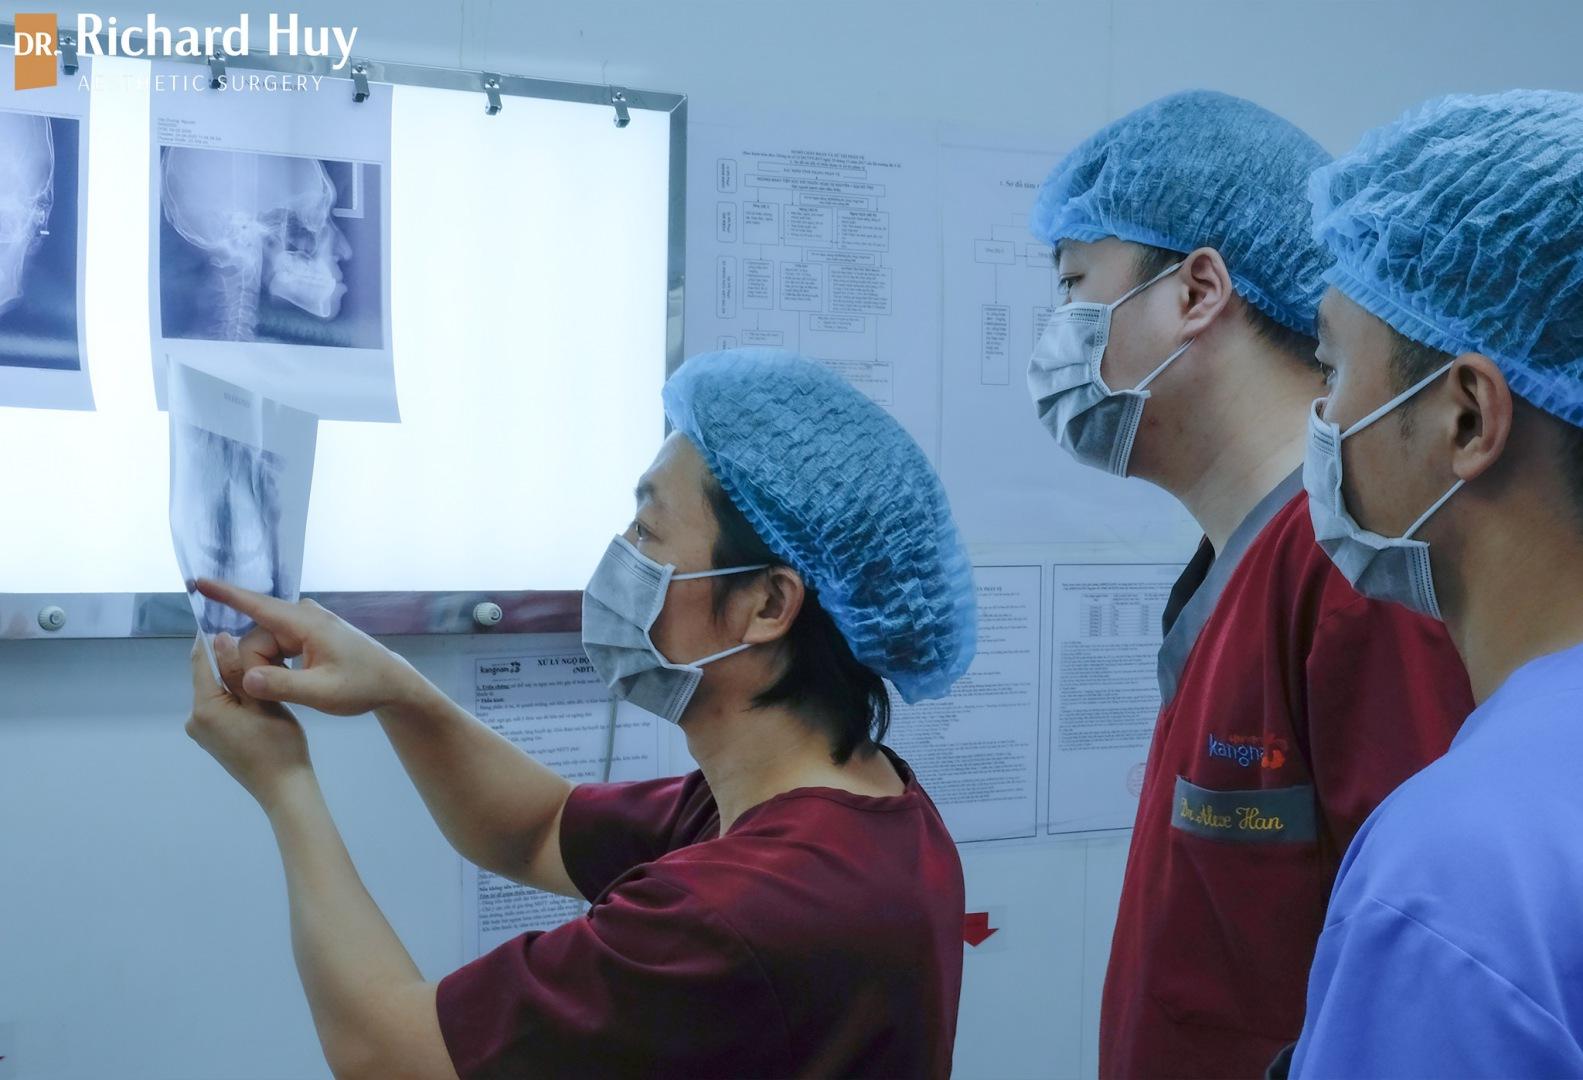 phẫu thuật thẩm mỹ